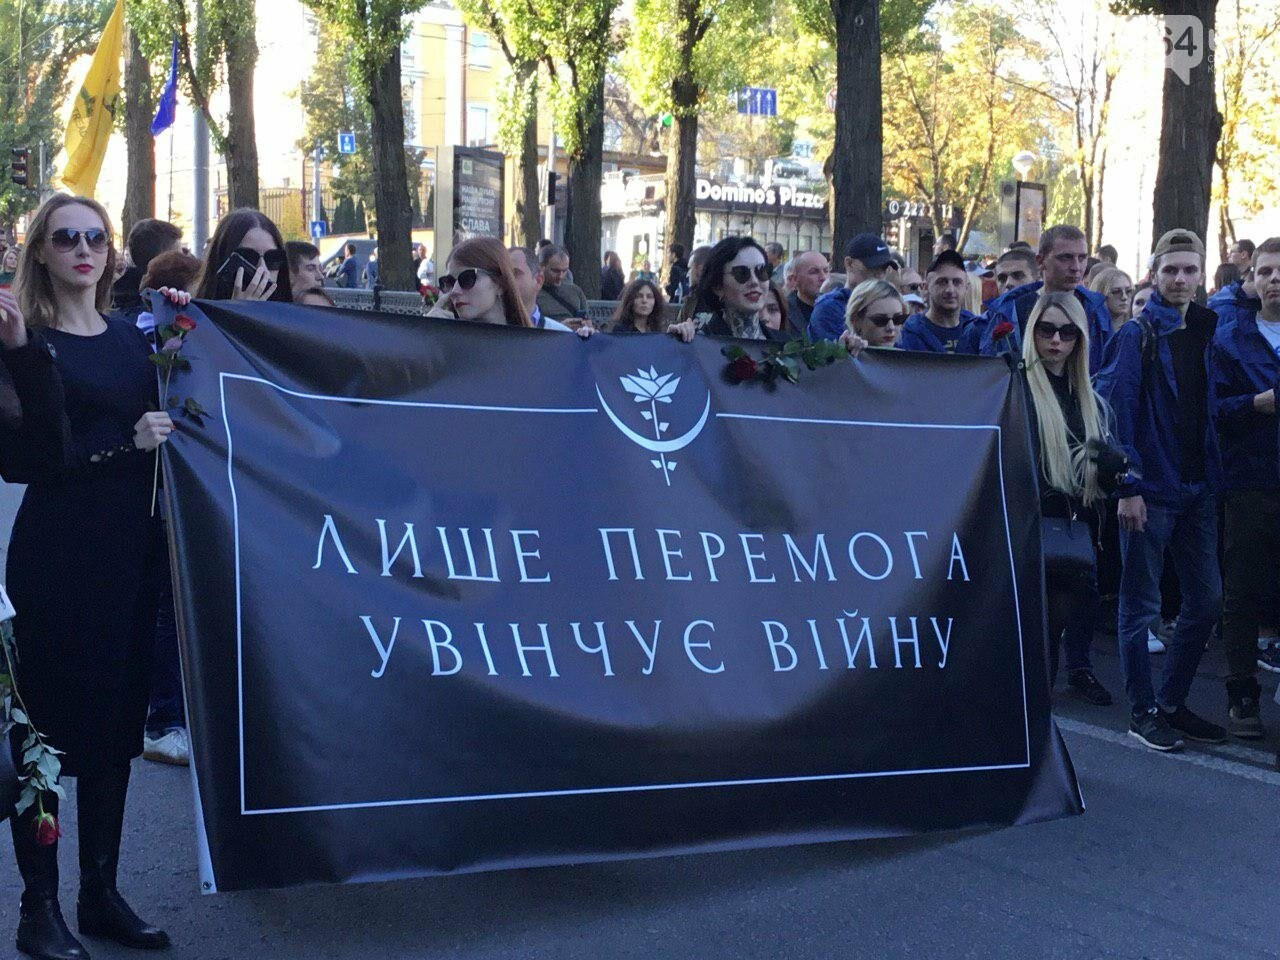 Криворожане поддержали Марш сопротивления капитуляции в Киеве, - ФОТО, ВИДЕО, ОБНОВЛЕНО, фото-7